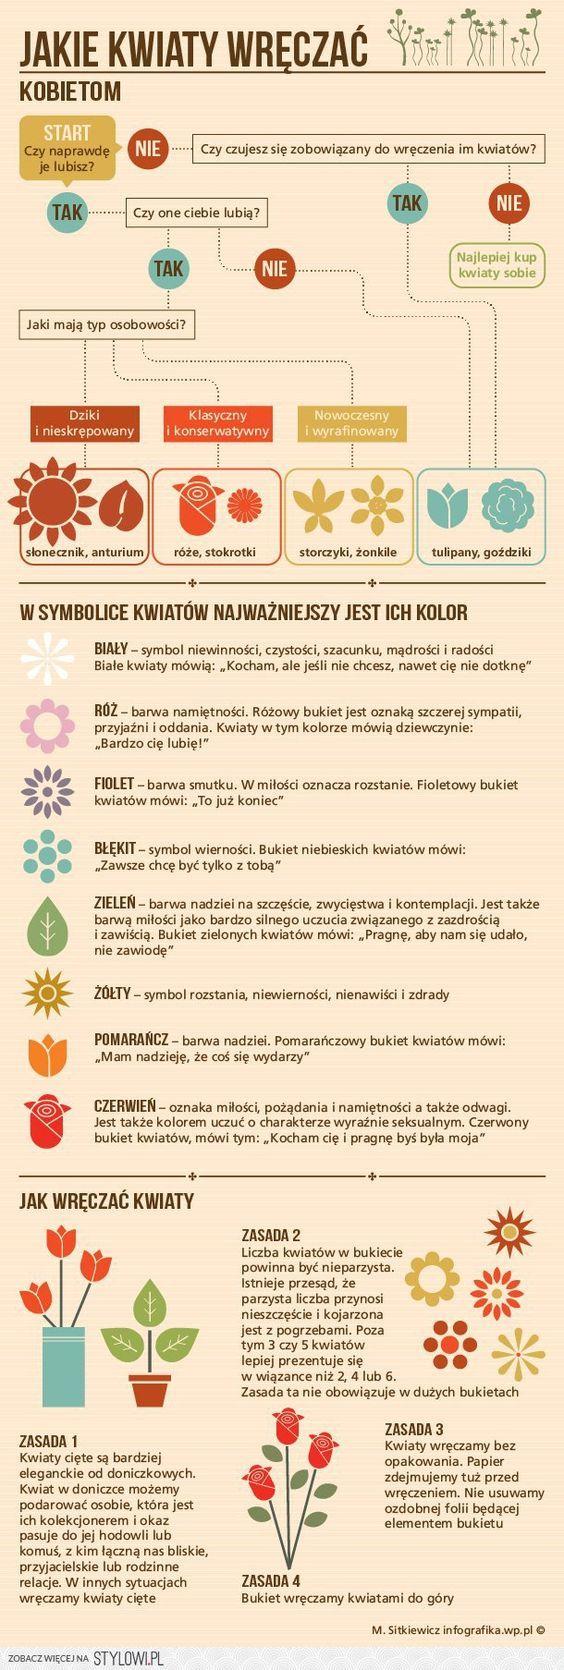 Pin By S Z Y N S Z Y L On Ciekawostki Editing Writing Writing Teaching